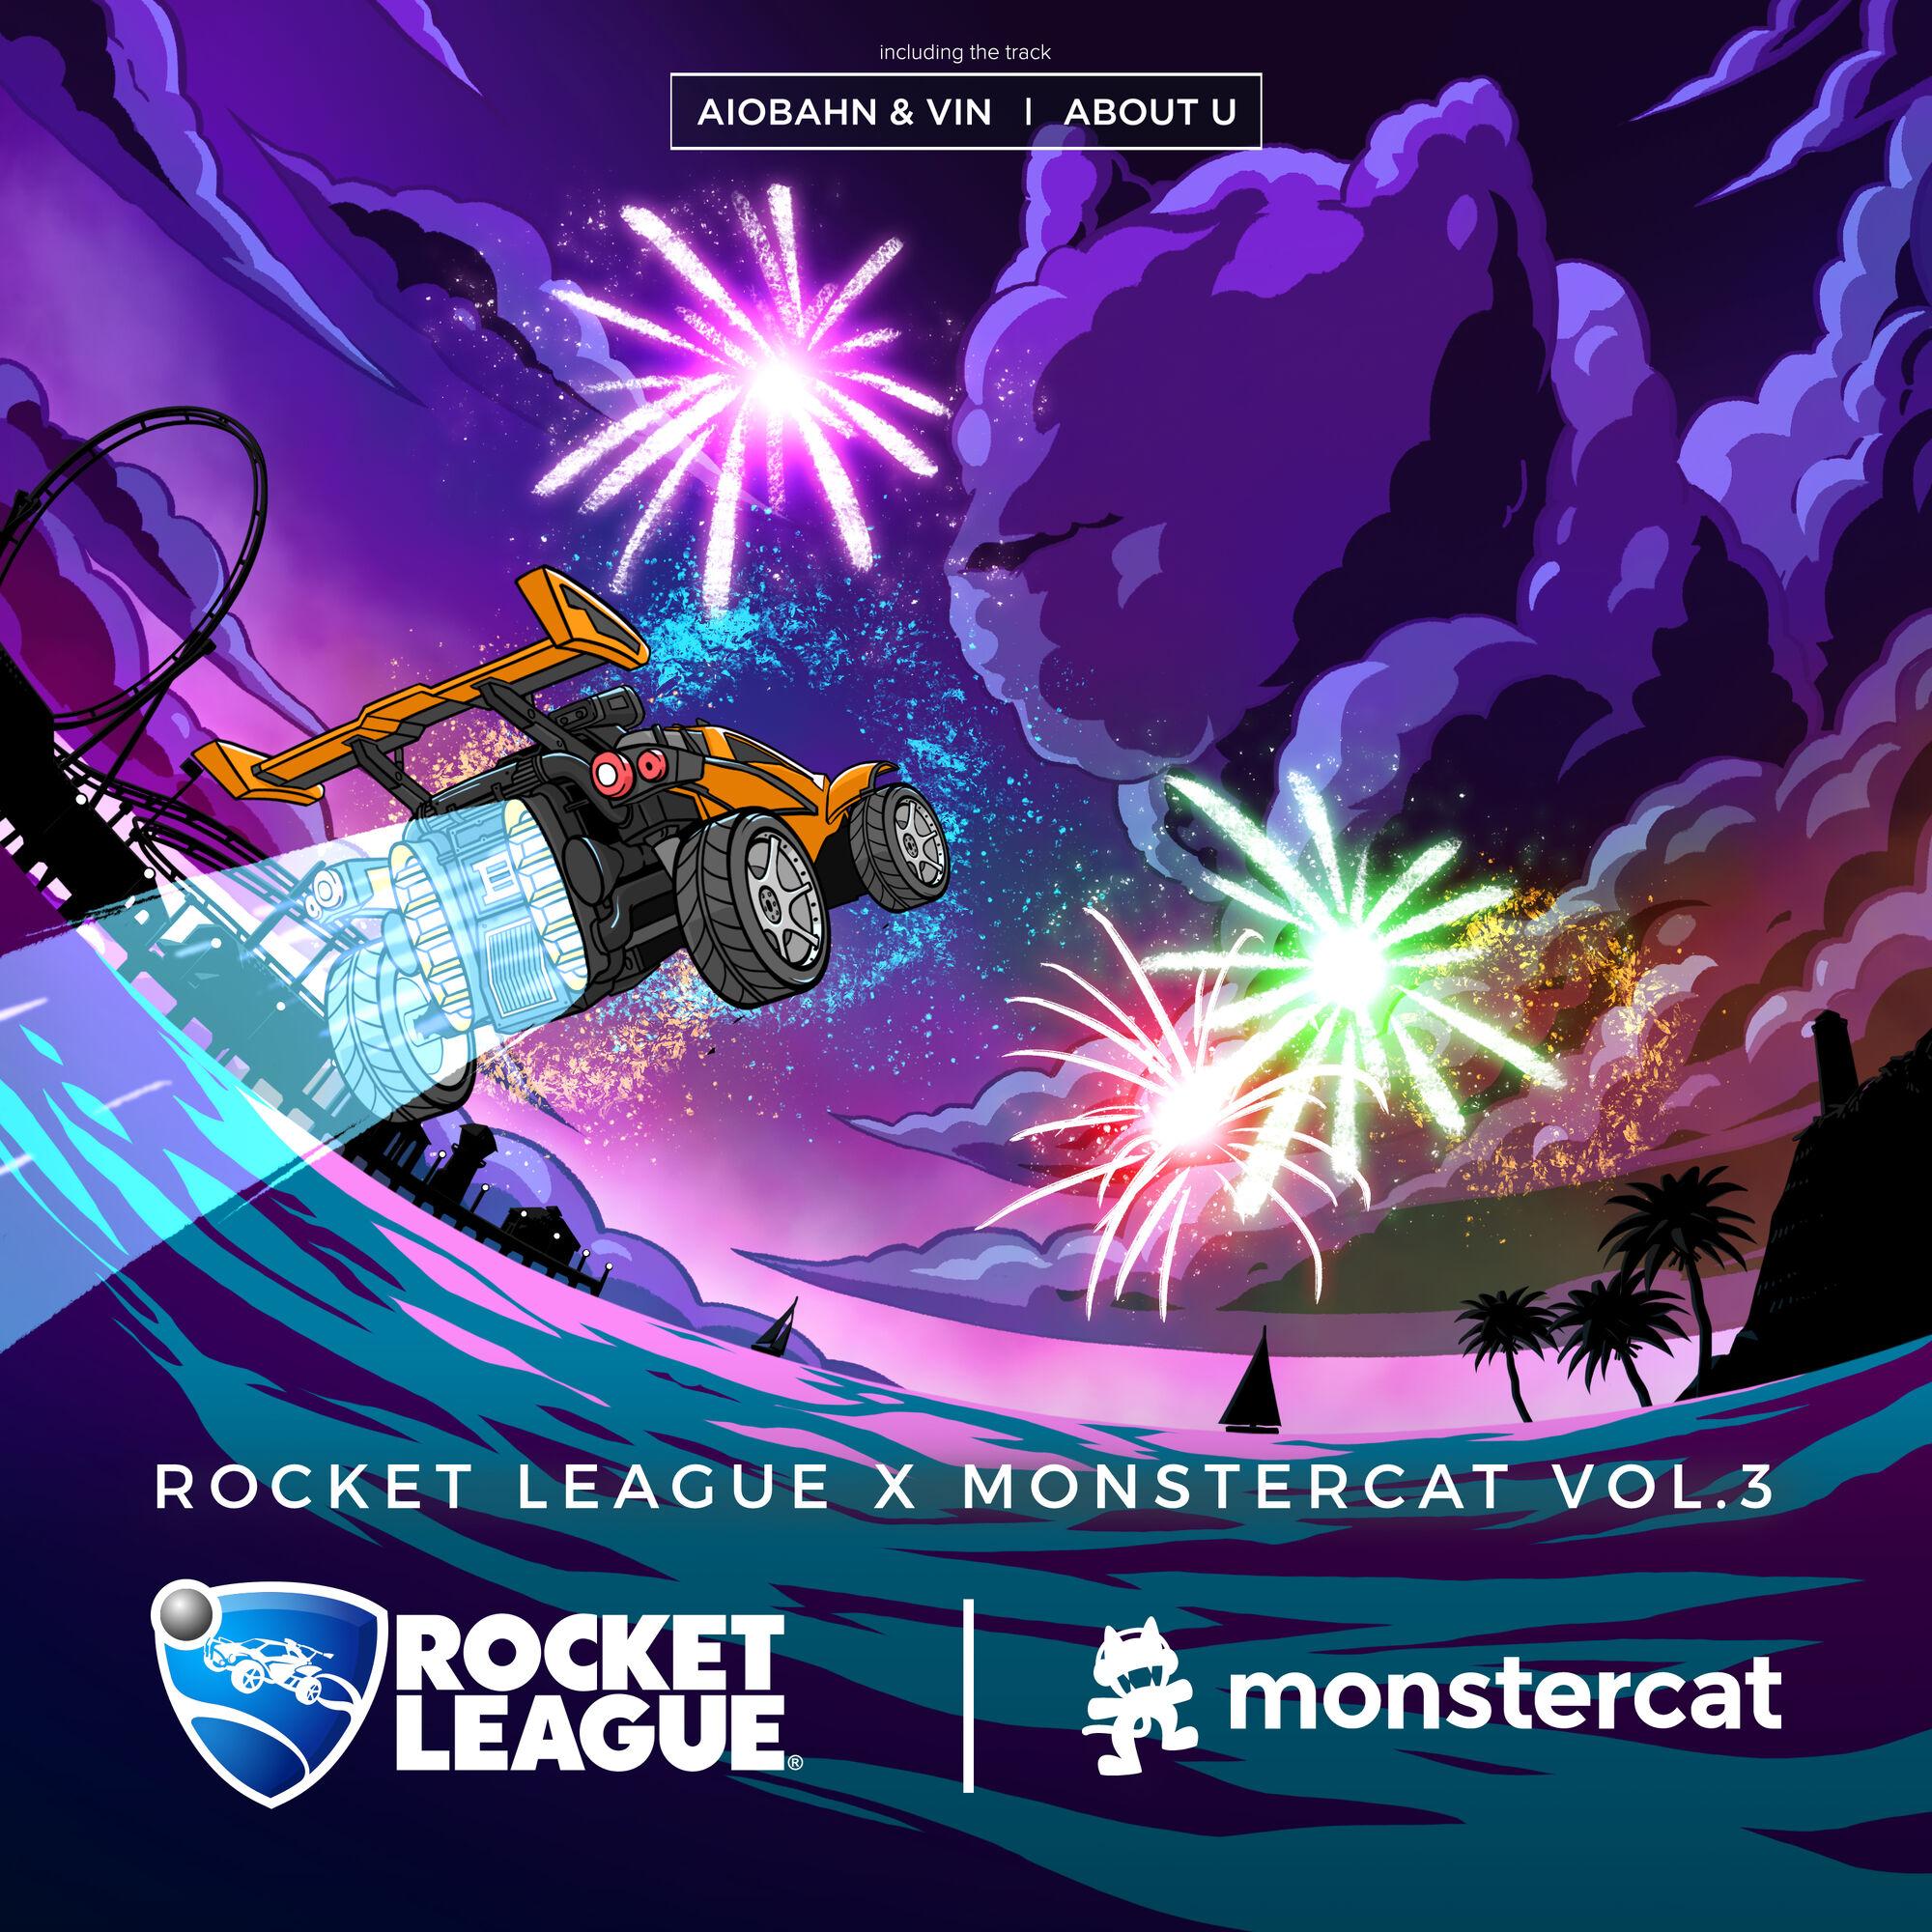 About U   Monstercat Wiki   FANDOM powered by Wikia